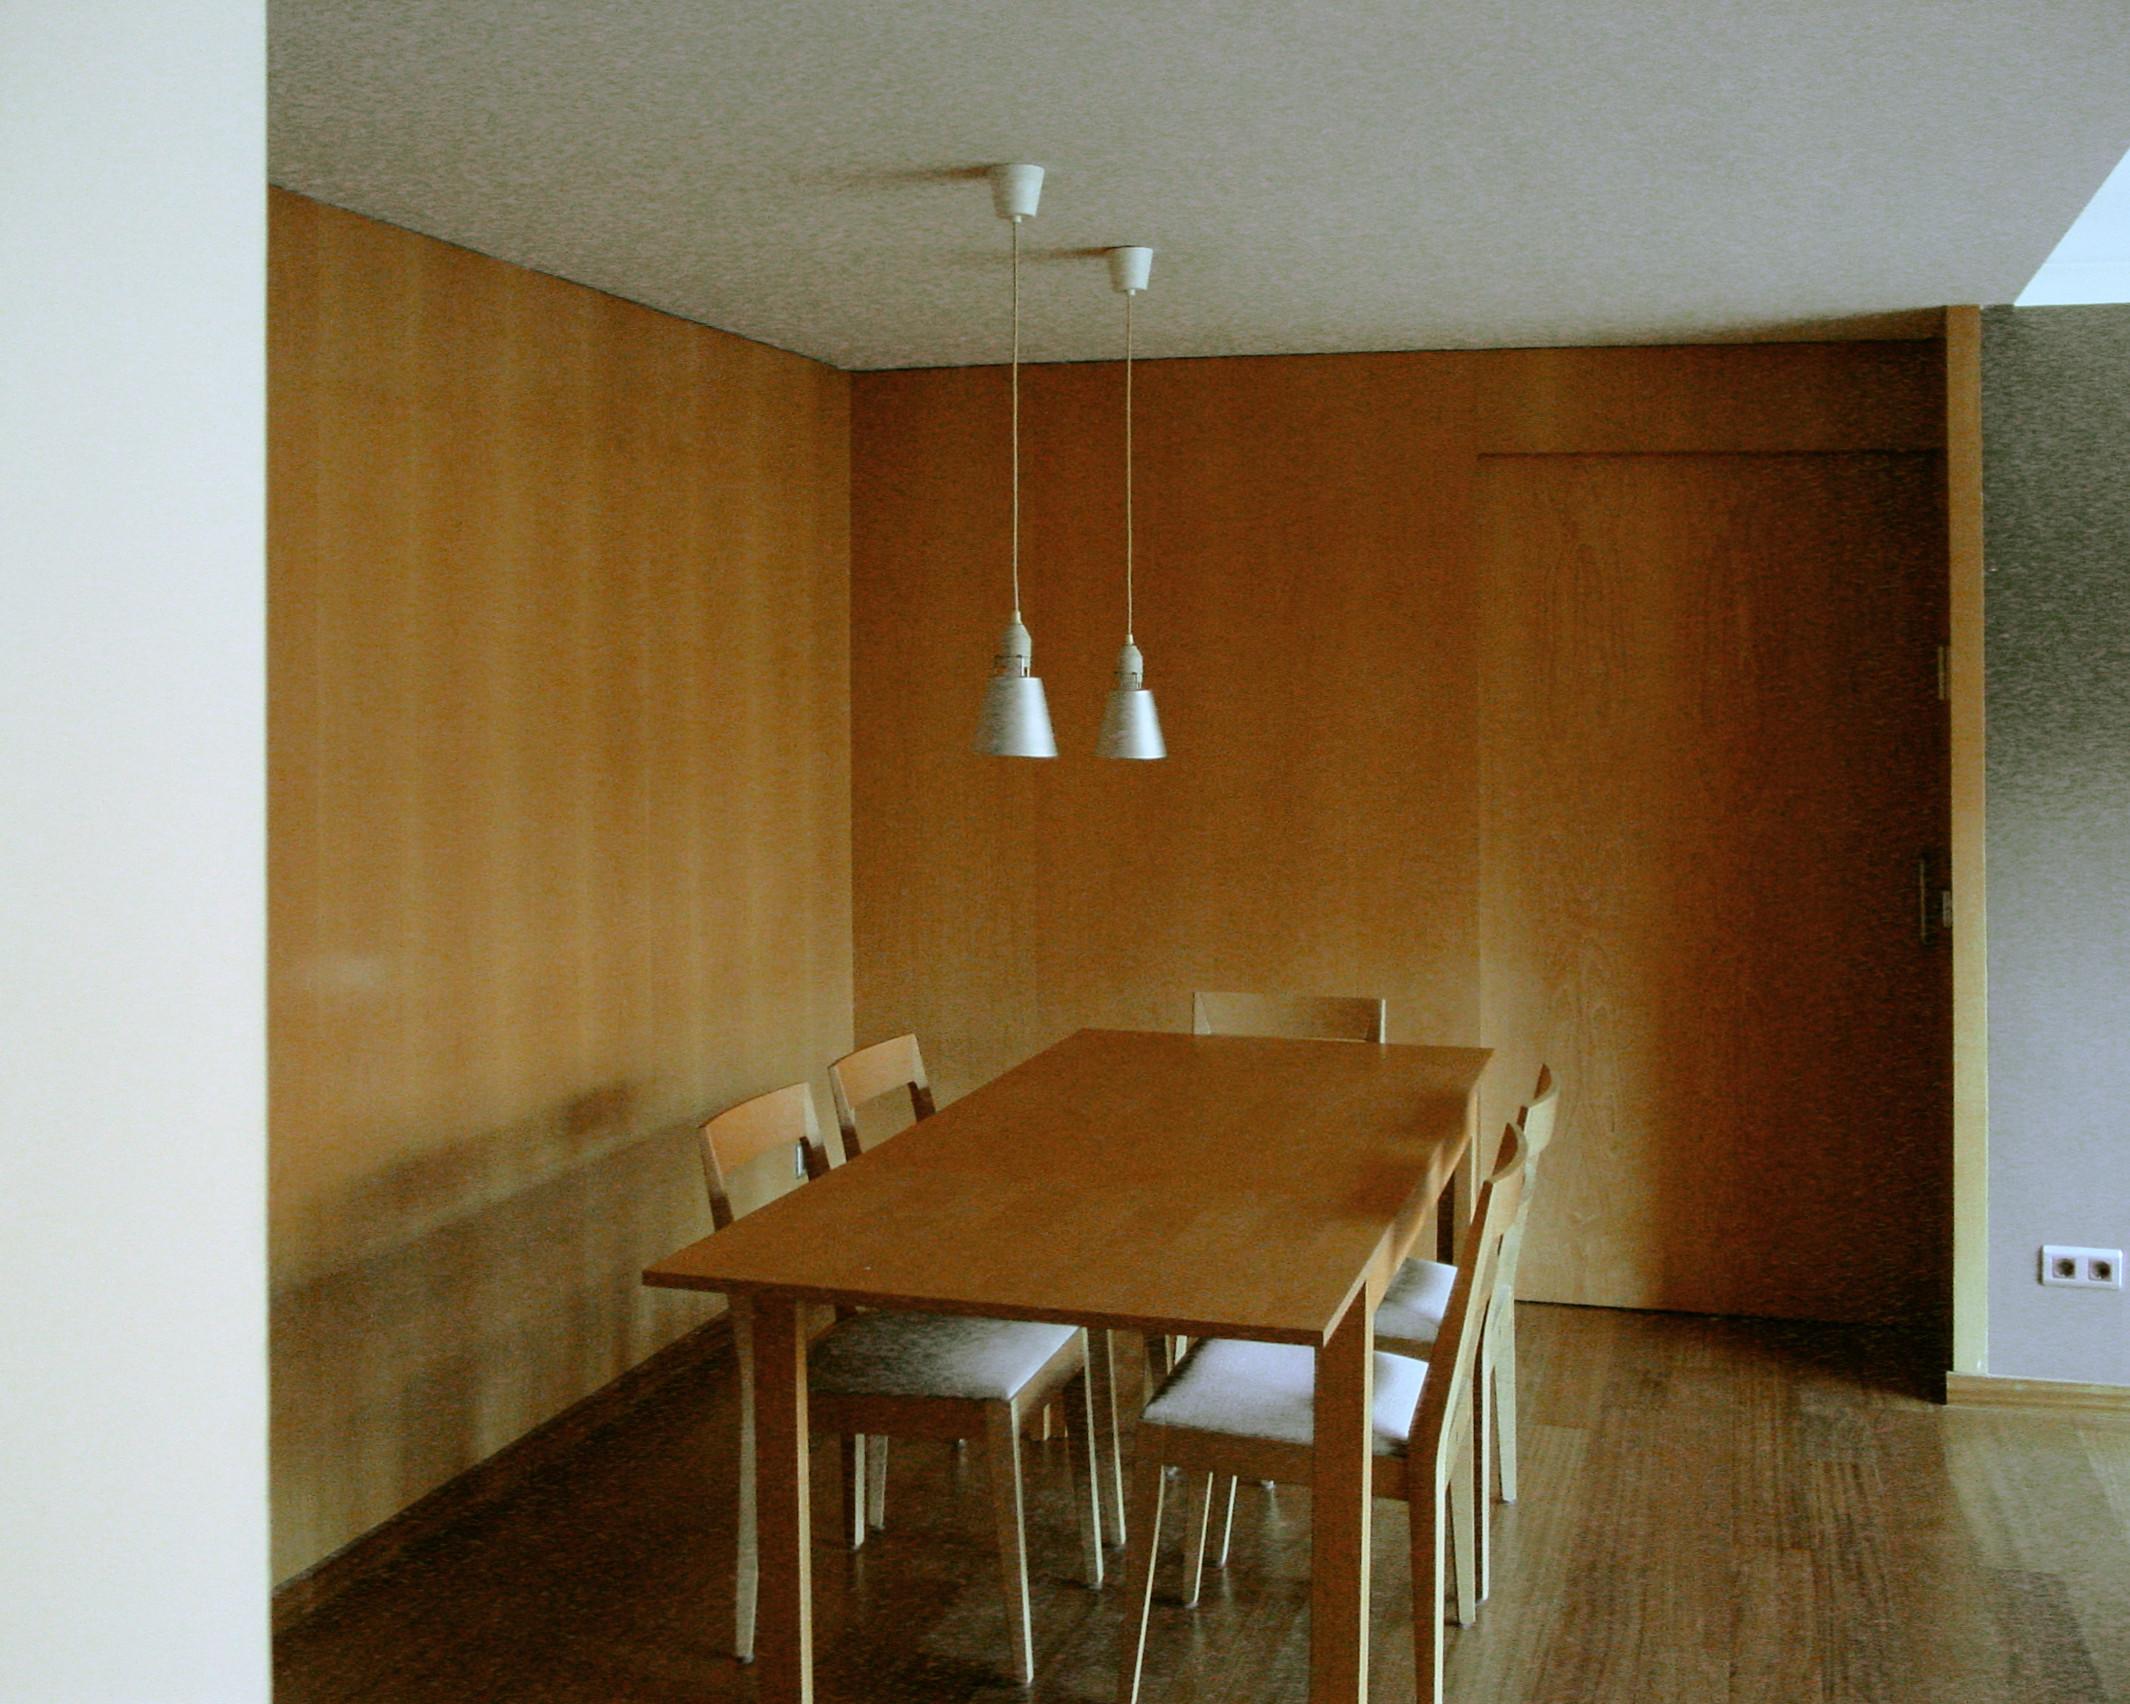 Reforma integral de vivienda en calle Déu i Mata de Barcelona